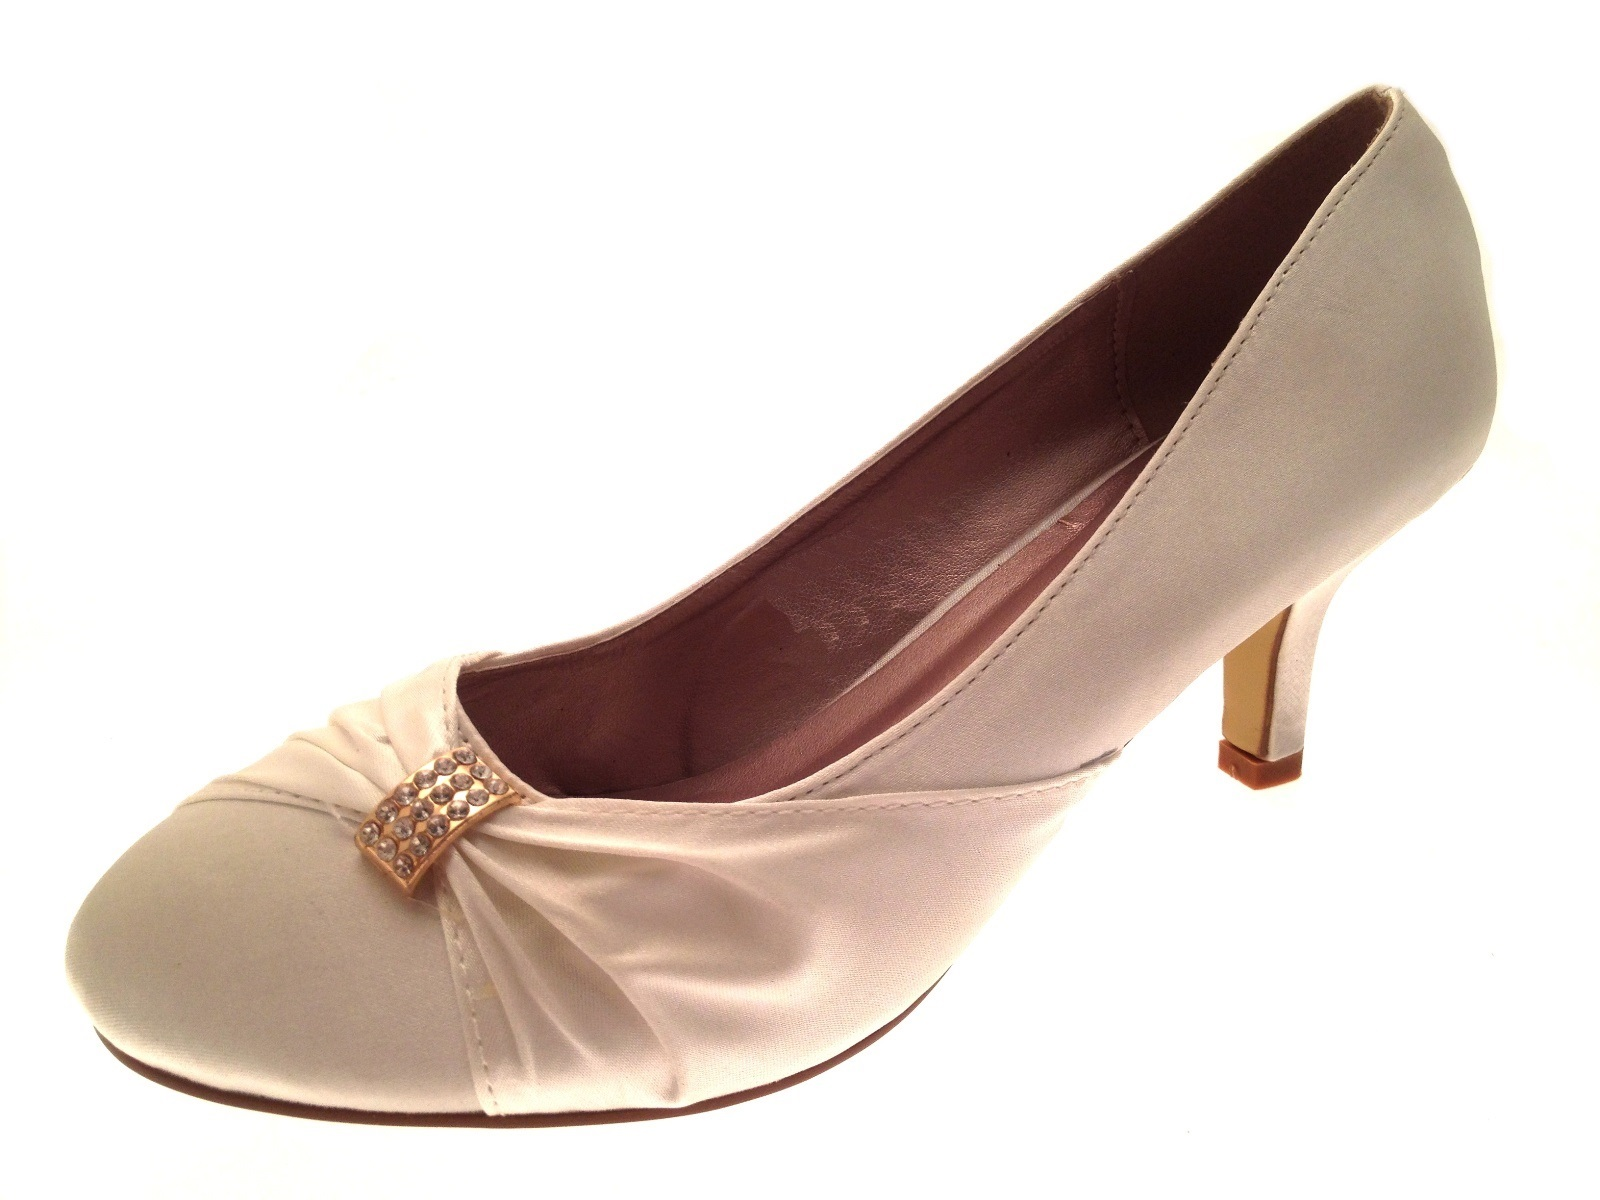 Womens-Low-Heel-Satin-Diamante-Wedding-Heels-Bridal-